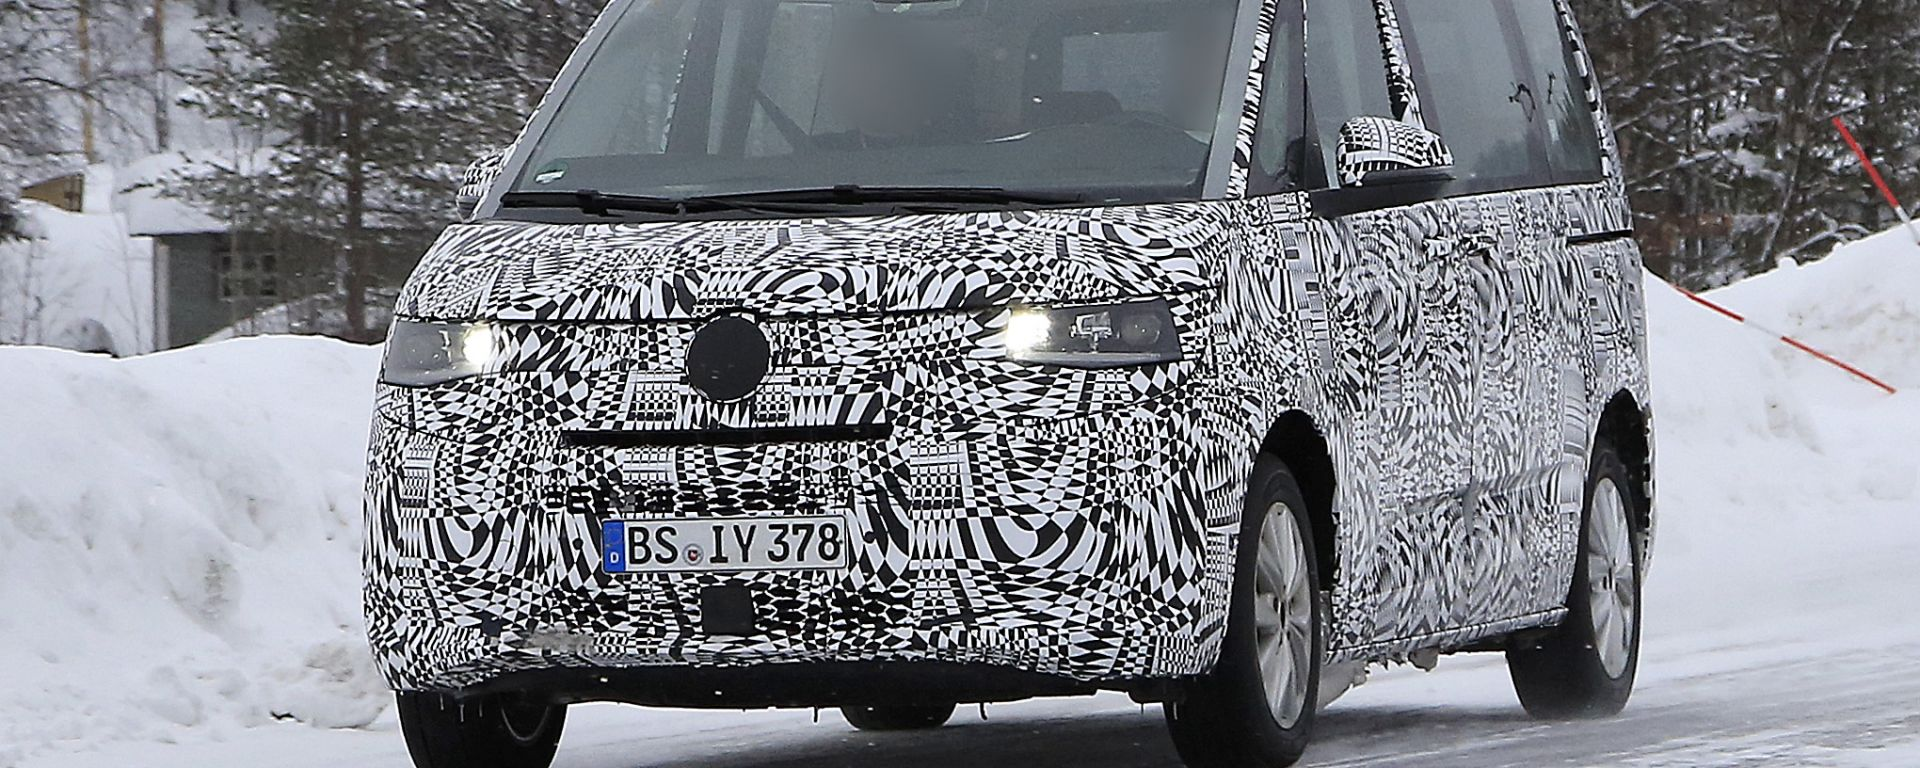 Volkswagen Transporter 2021: le foto spia